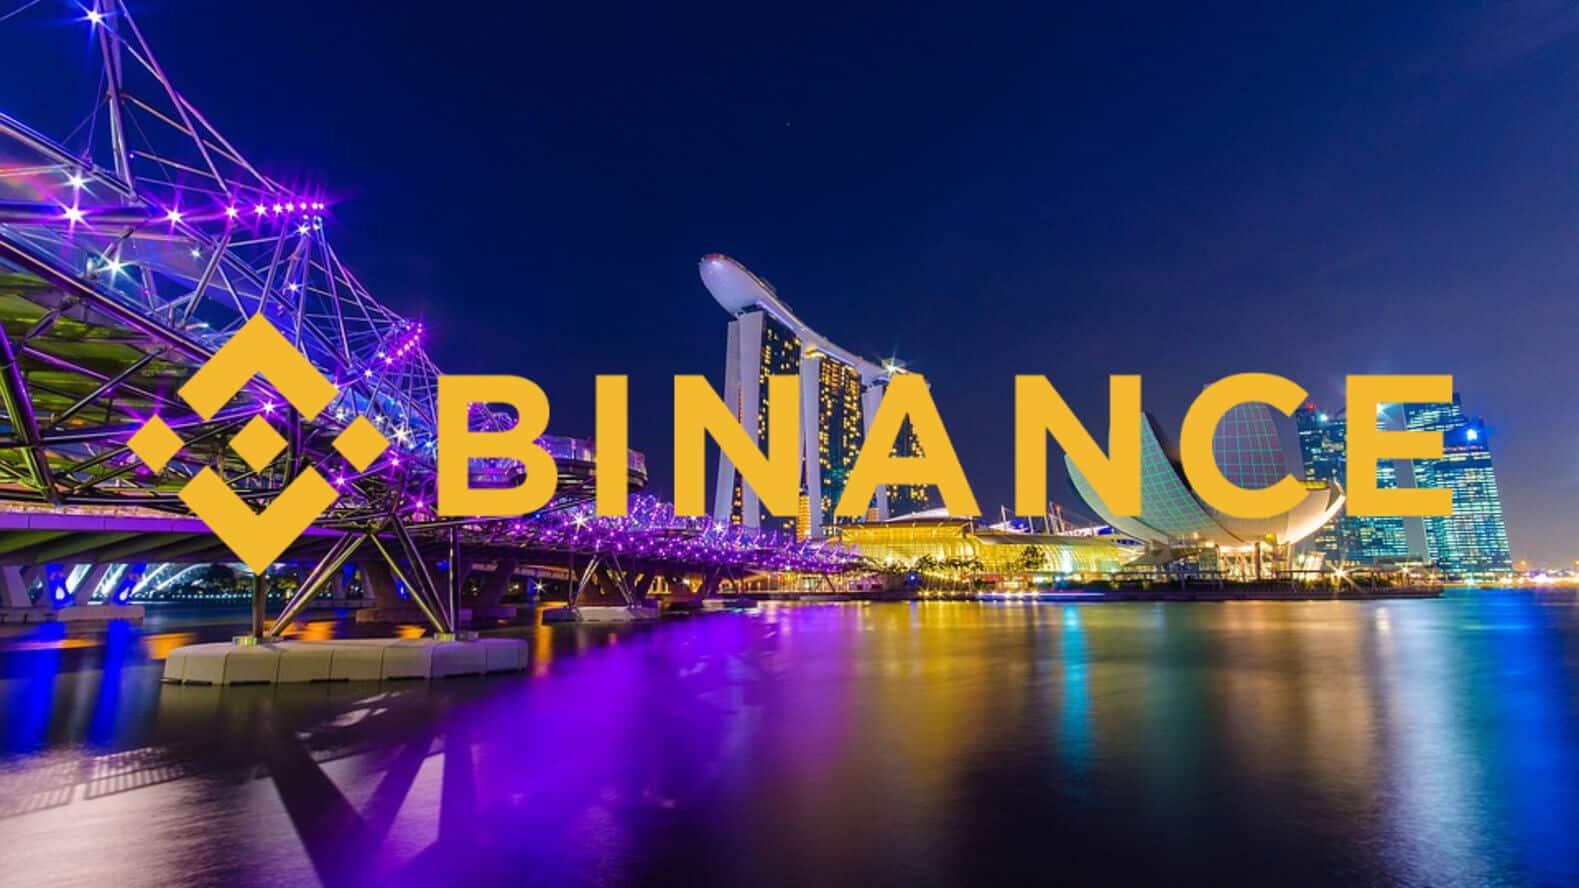 Binance Launches its Singapore